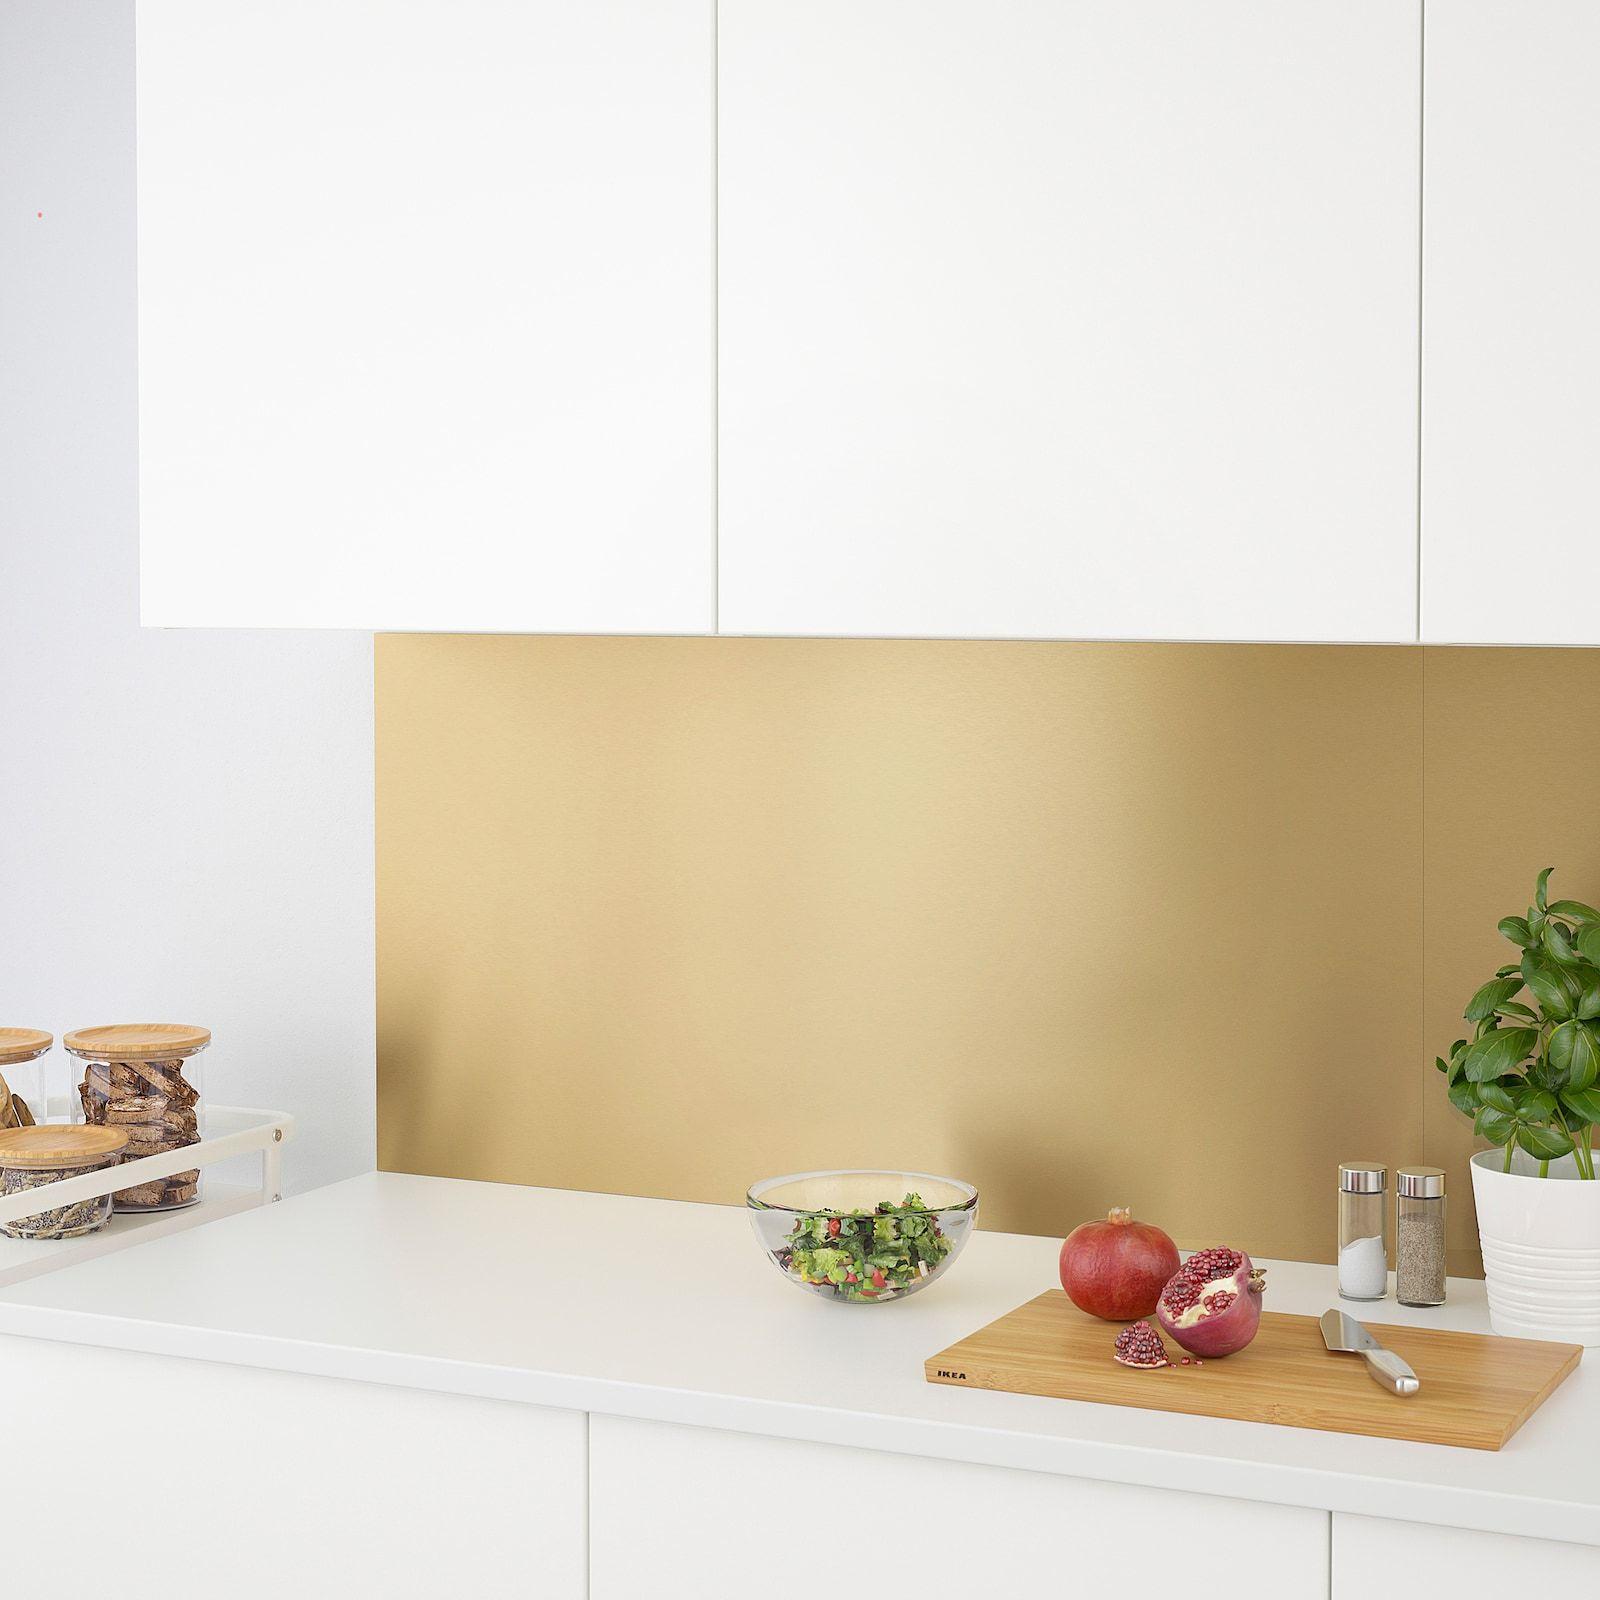 Lysekil Wandpaneel Tweezijdig Messingkleur Roestvrij Staalkleur Ikea In 2020 Wandpaneele Wandverkleidung Haus Interieurs